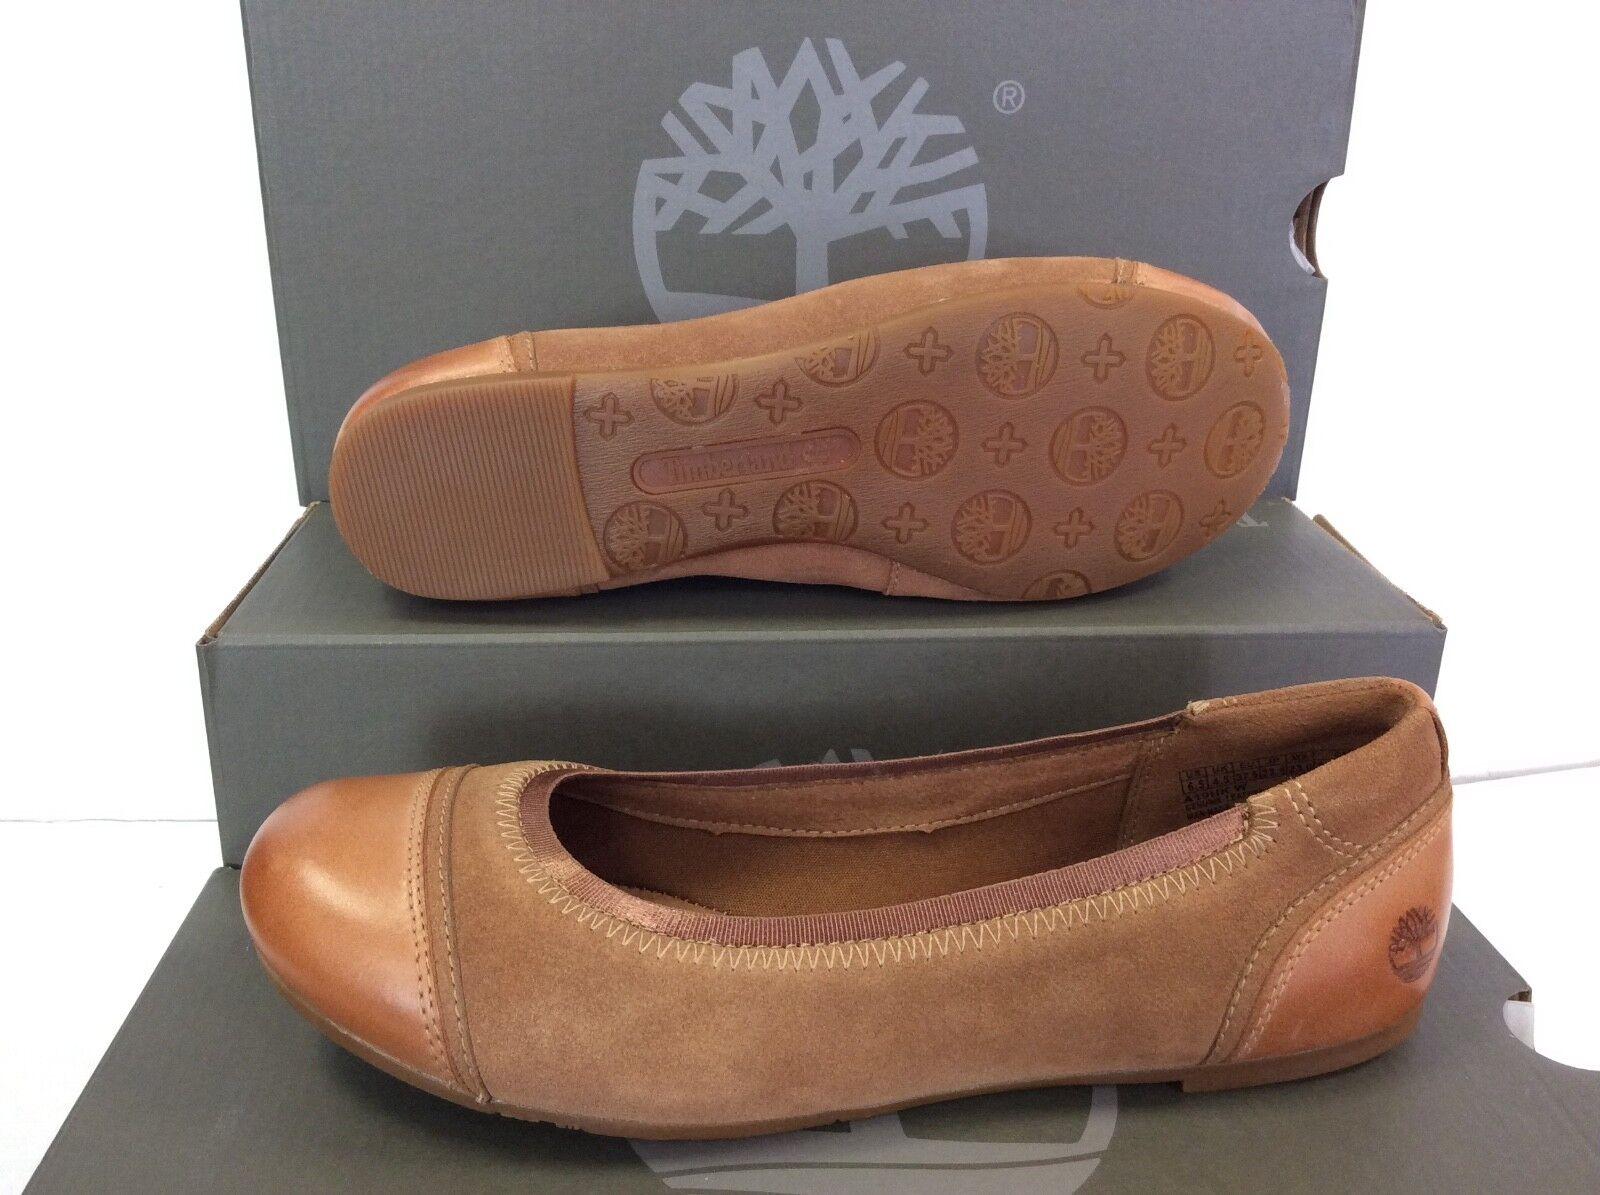 Timberland millbury ballerina mocassini donna scarpe scarpe scarpe A19HK, Taglia  EU 38   Lo stile più nuovo    Gentiluomo/Signora Scarpa  d68b6a